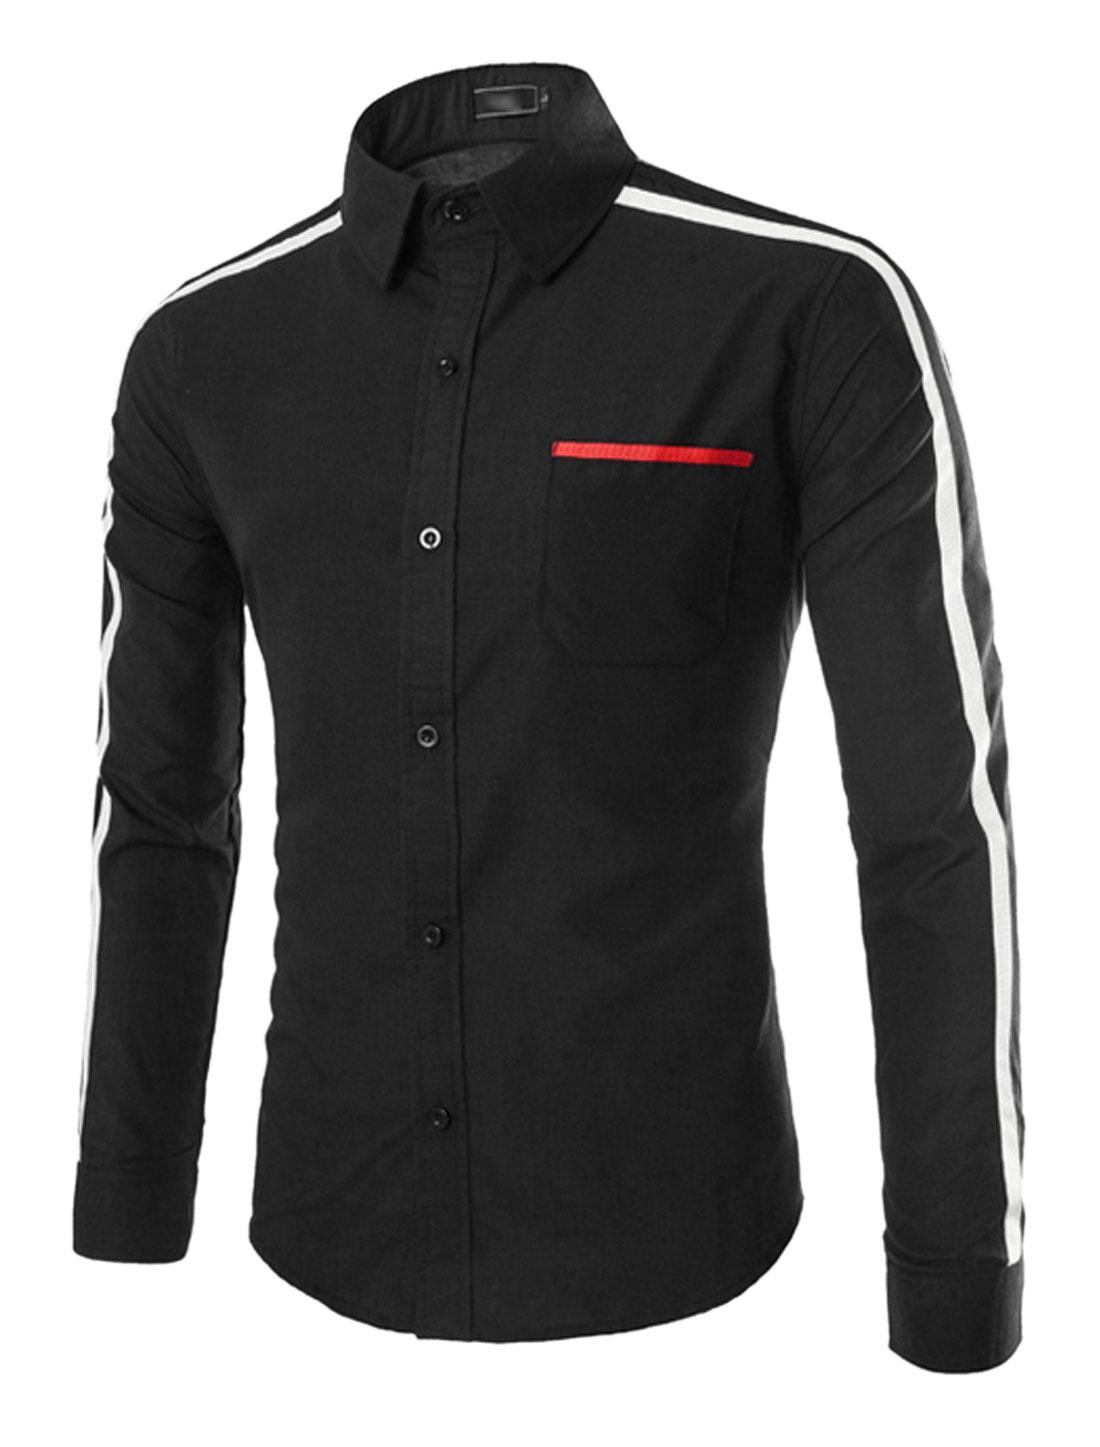 Men Stripes Detail Point Collar Button Down Slim Fit Shirts Black S